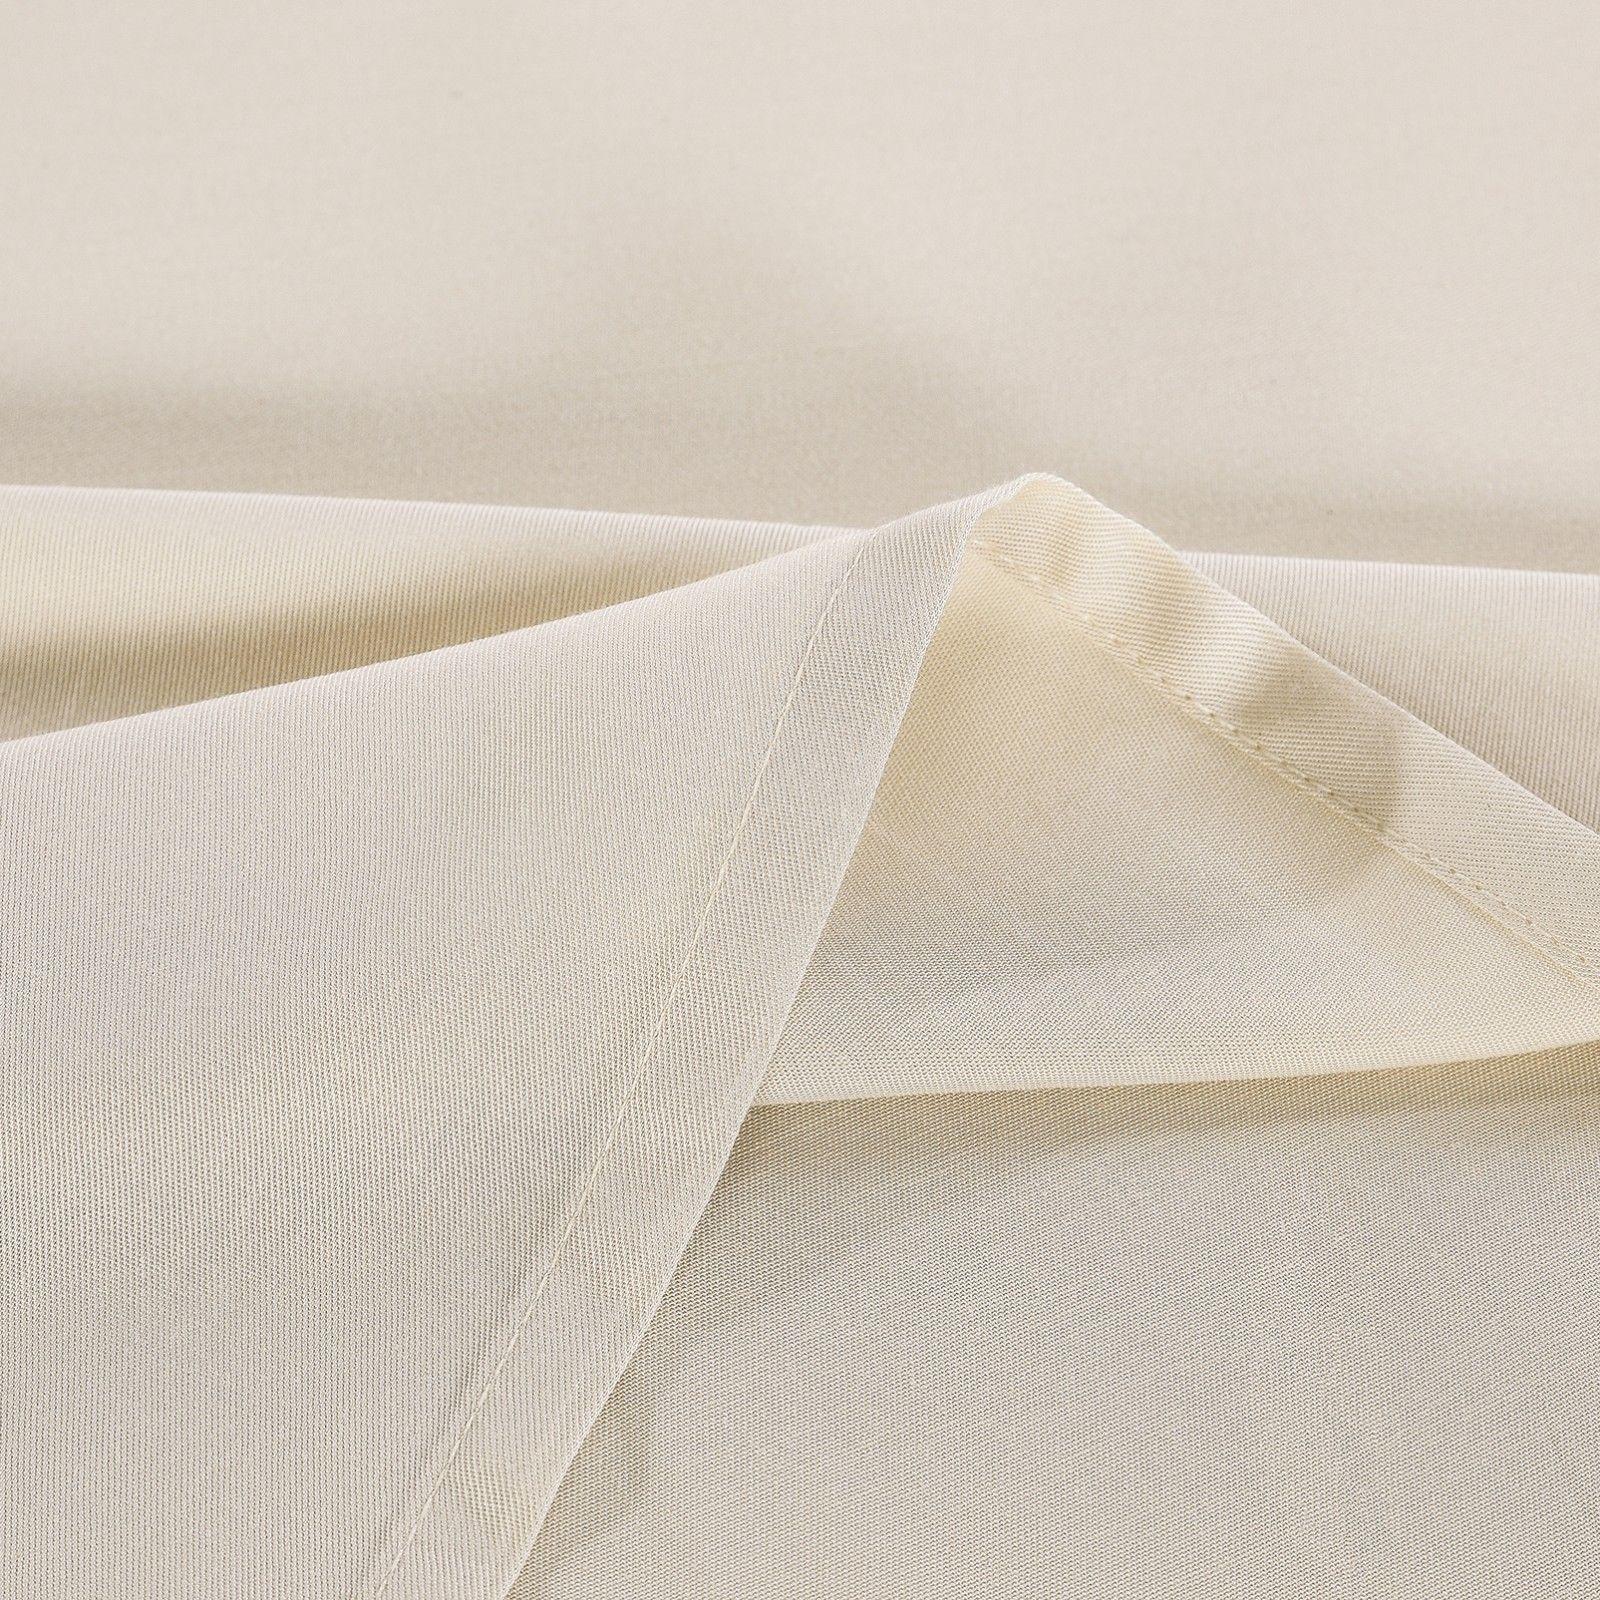 Royal-Comfort-Bamboo-Blended-Sheet-amp-Pillowcases-Set-1000TC-Ultra-Soft-Bedding thumbnail 21